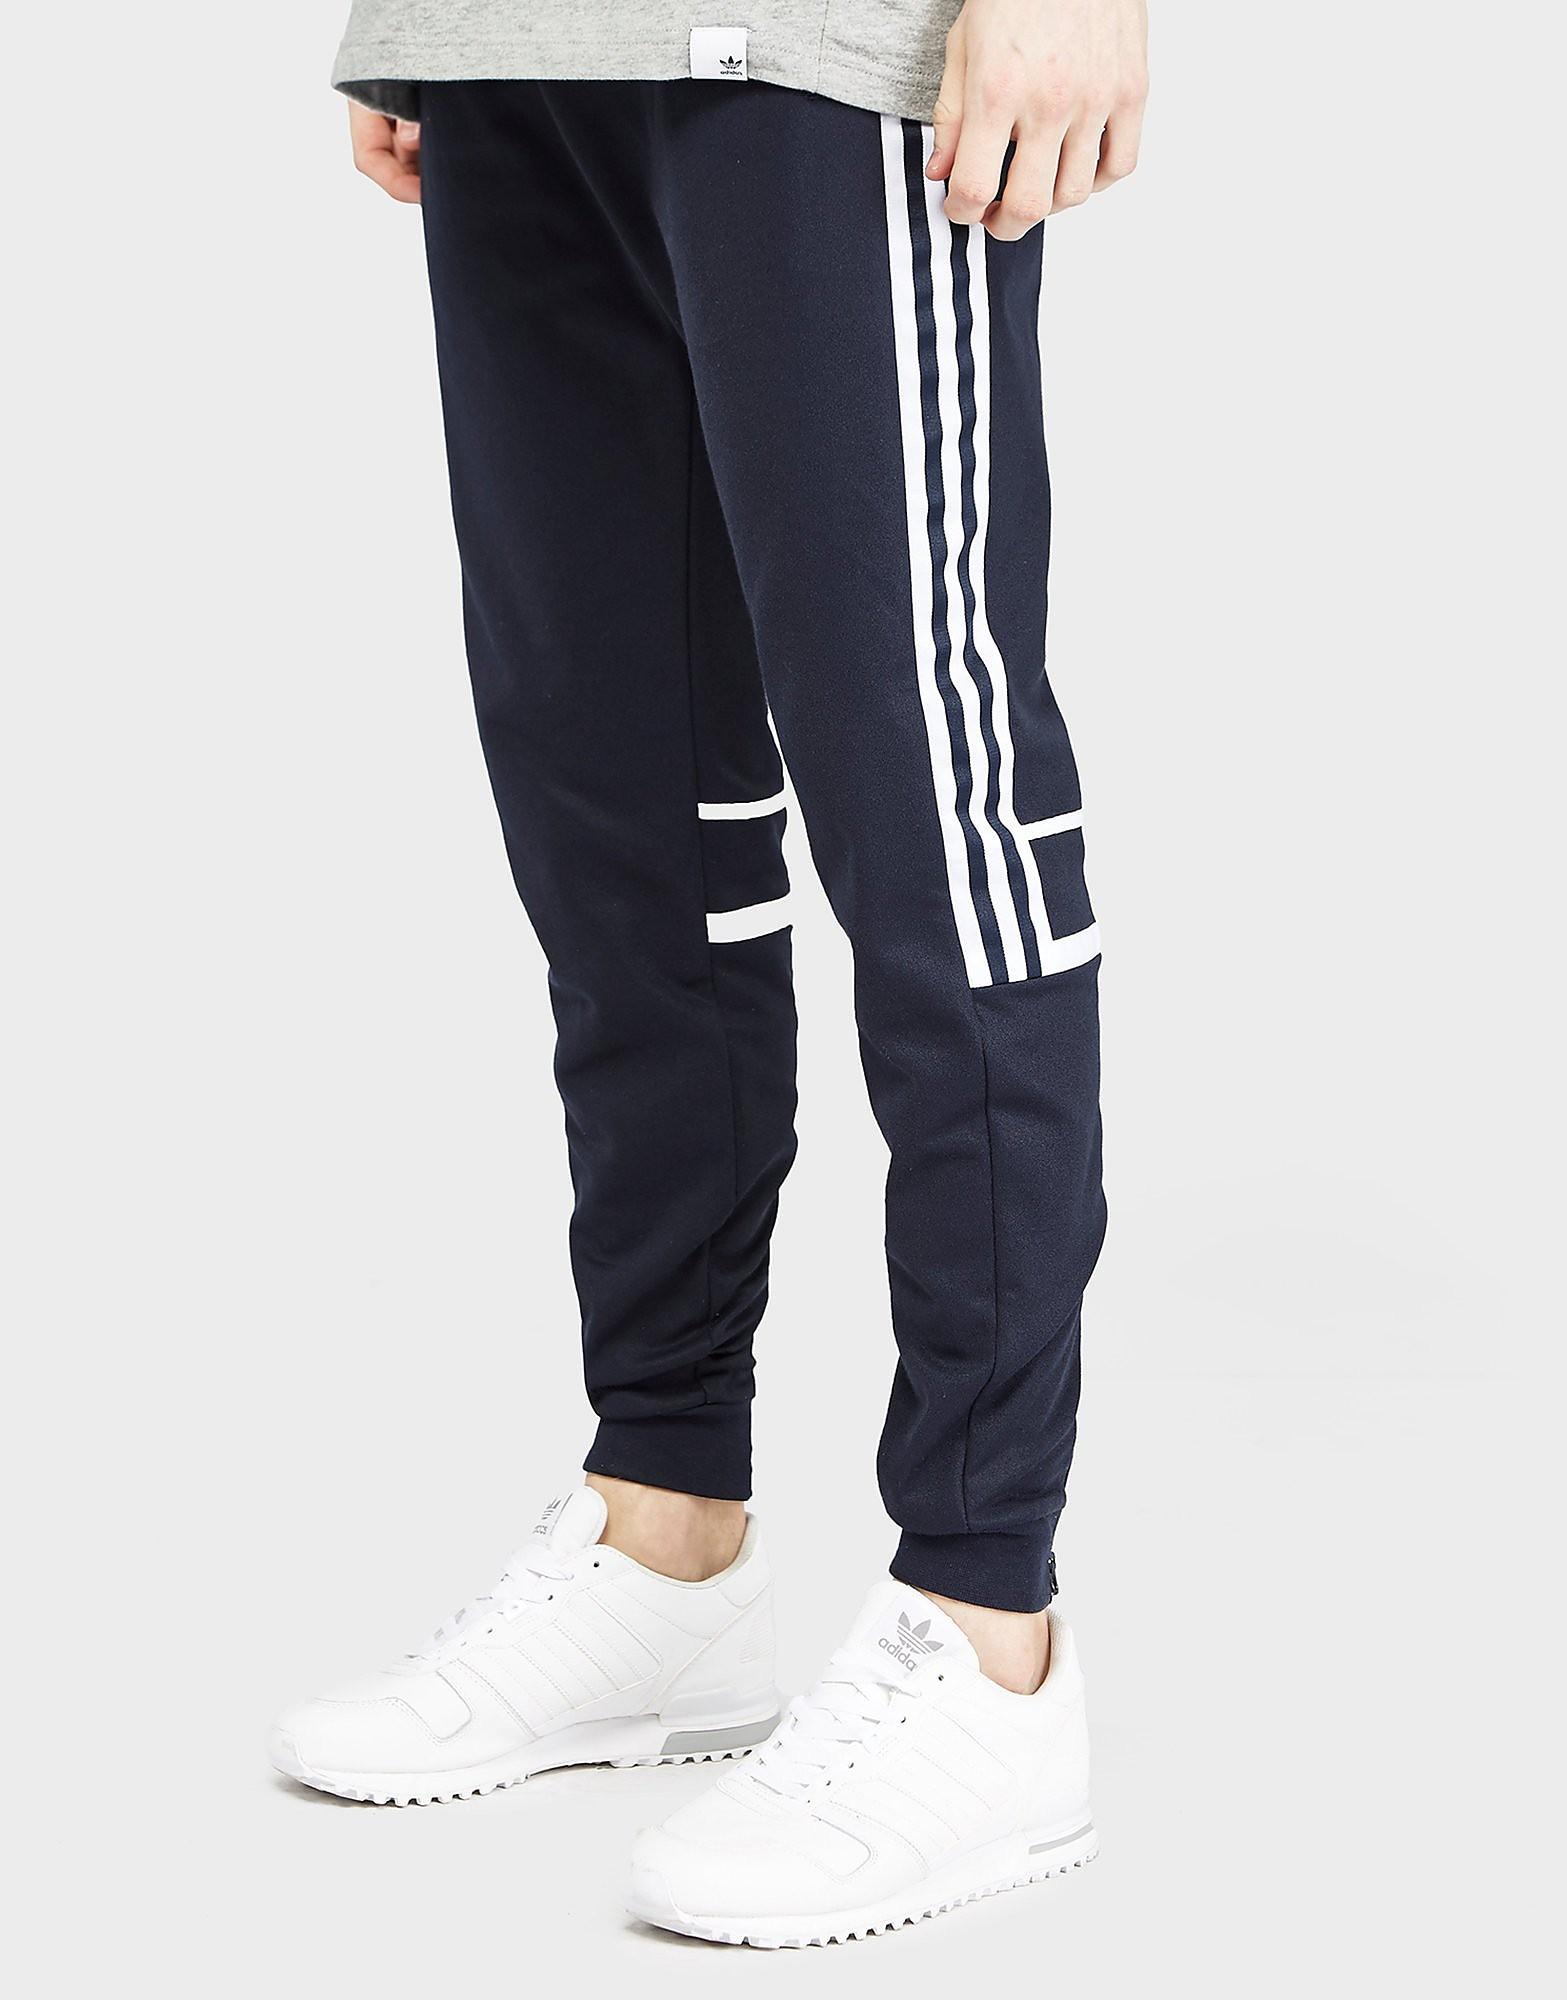 adidas Originals Challenger Track Pants  Navy Navy